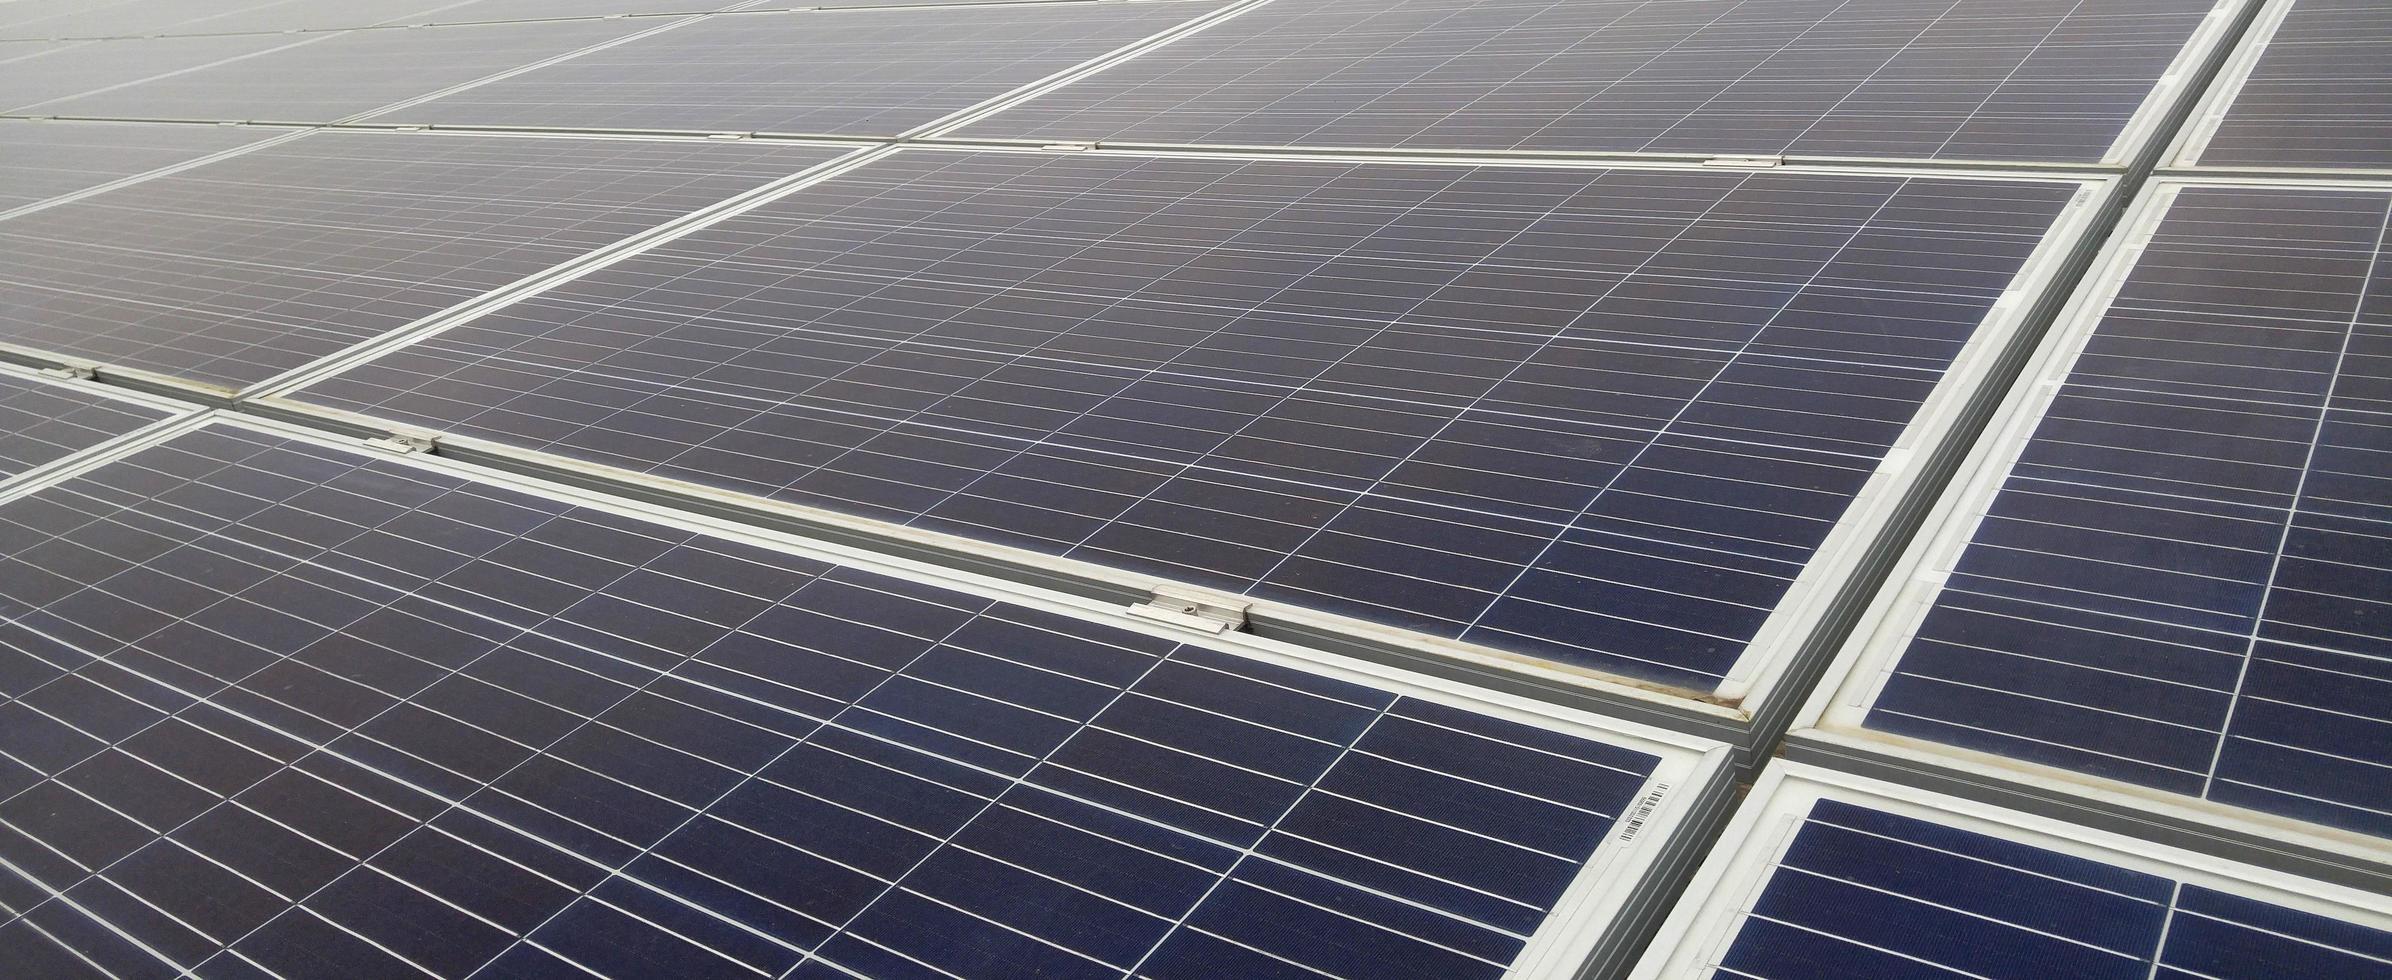 Solarmodule Nahaufnahme foto